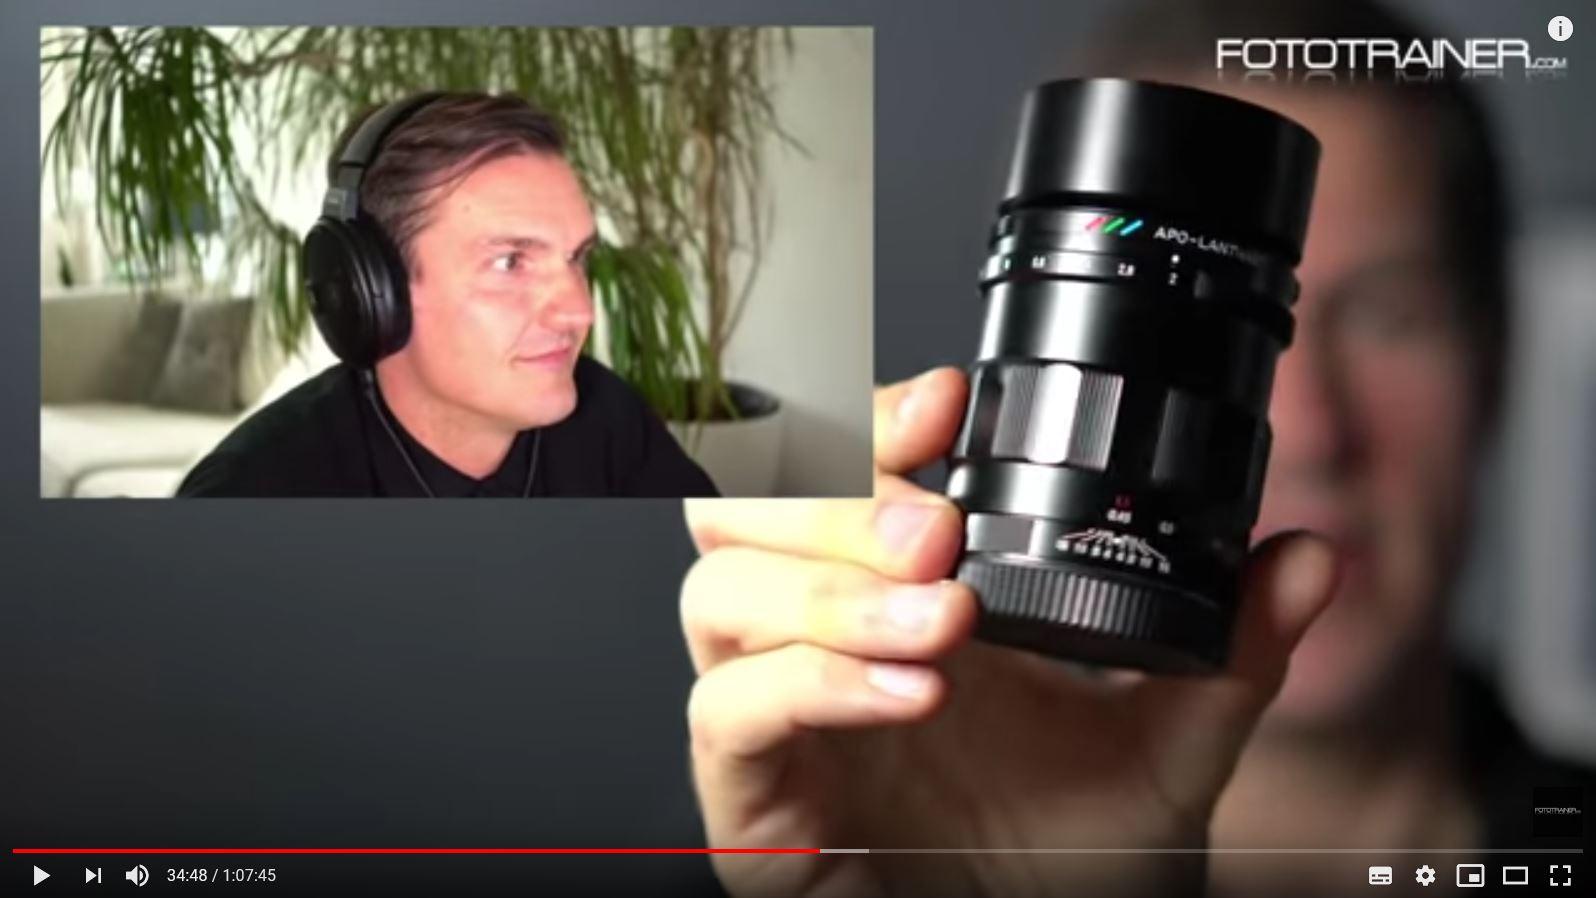 50mm Festbrennweiten für die Sony A7 Serie – Objektiv-Talk mit Stefan Gericke & Christian Laxander